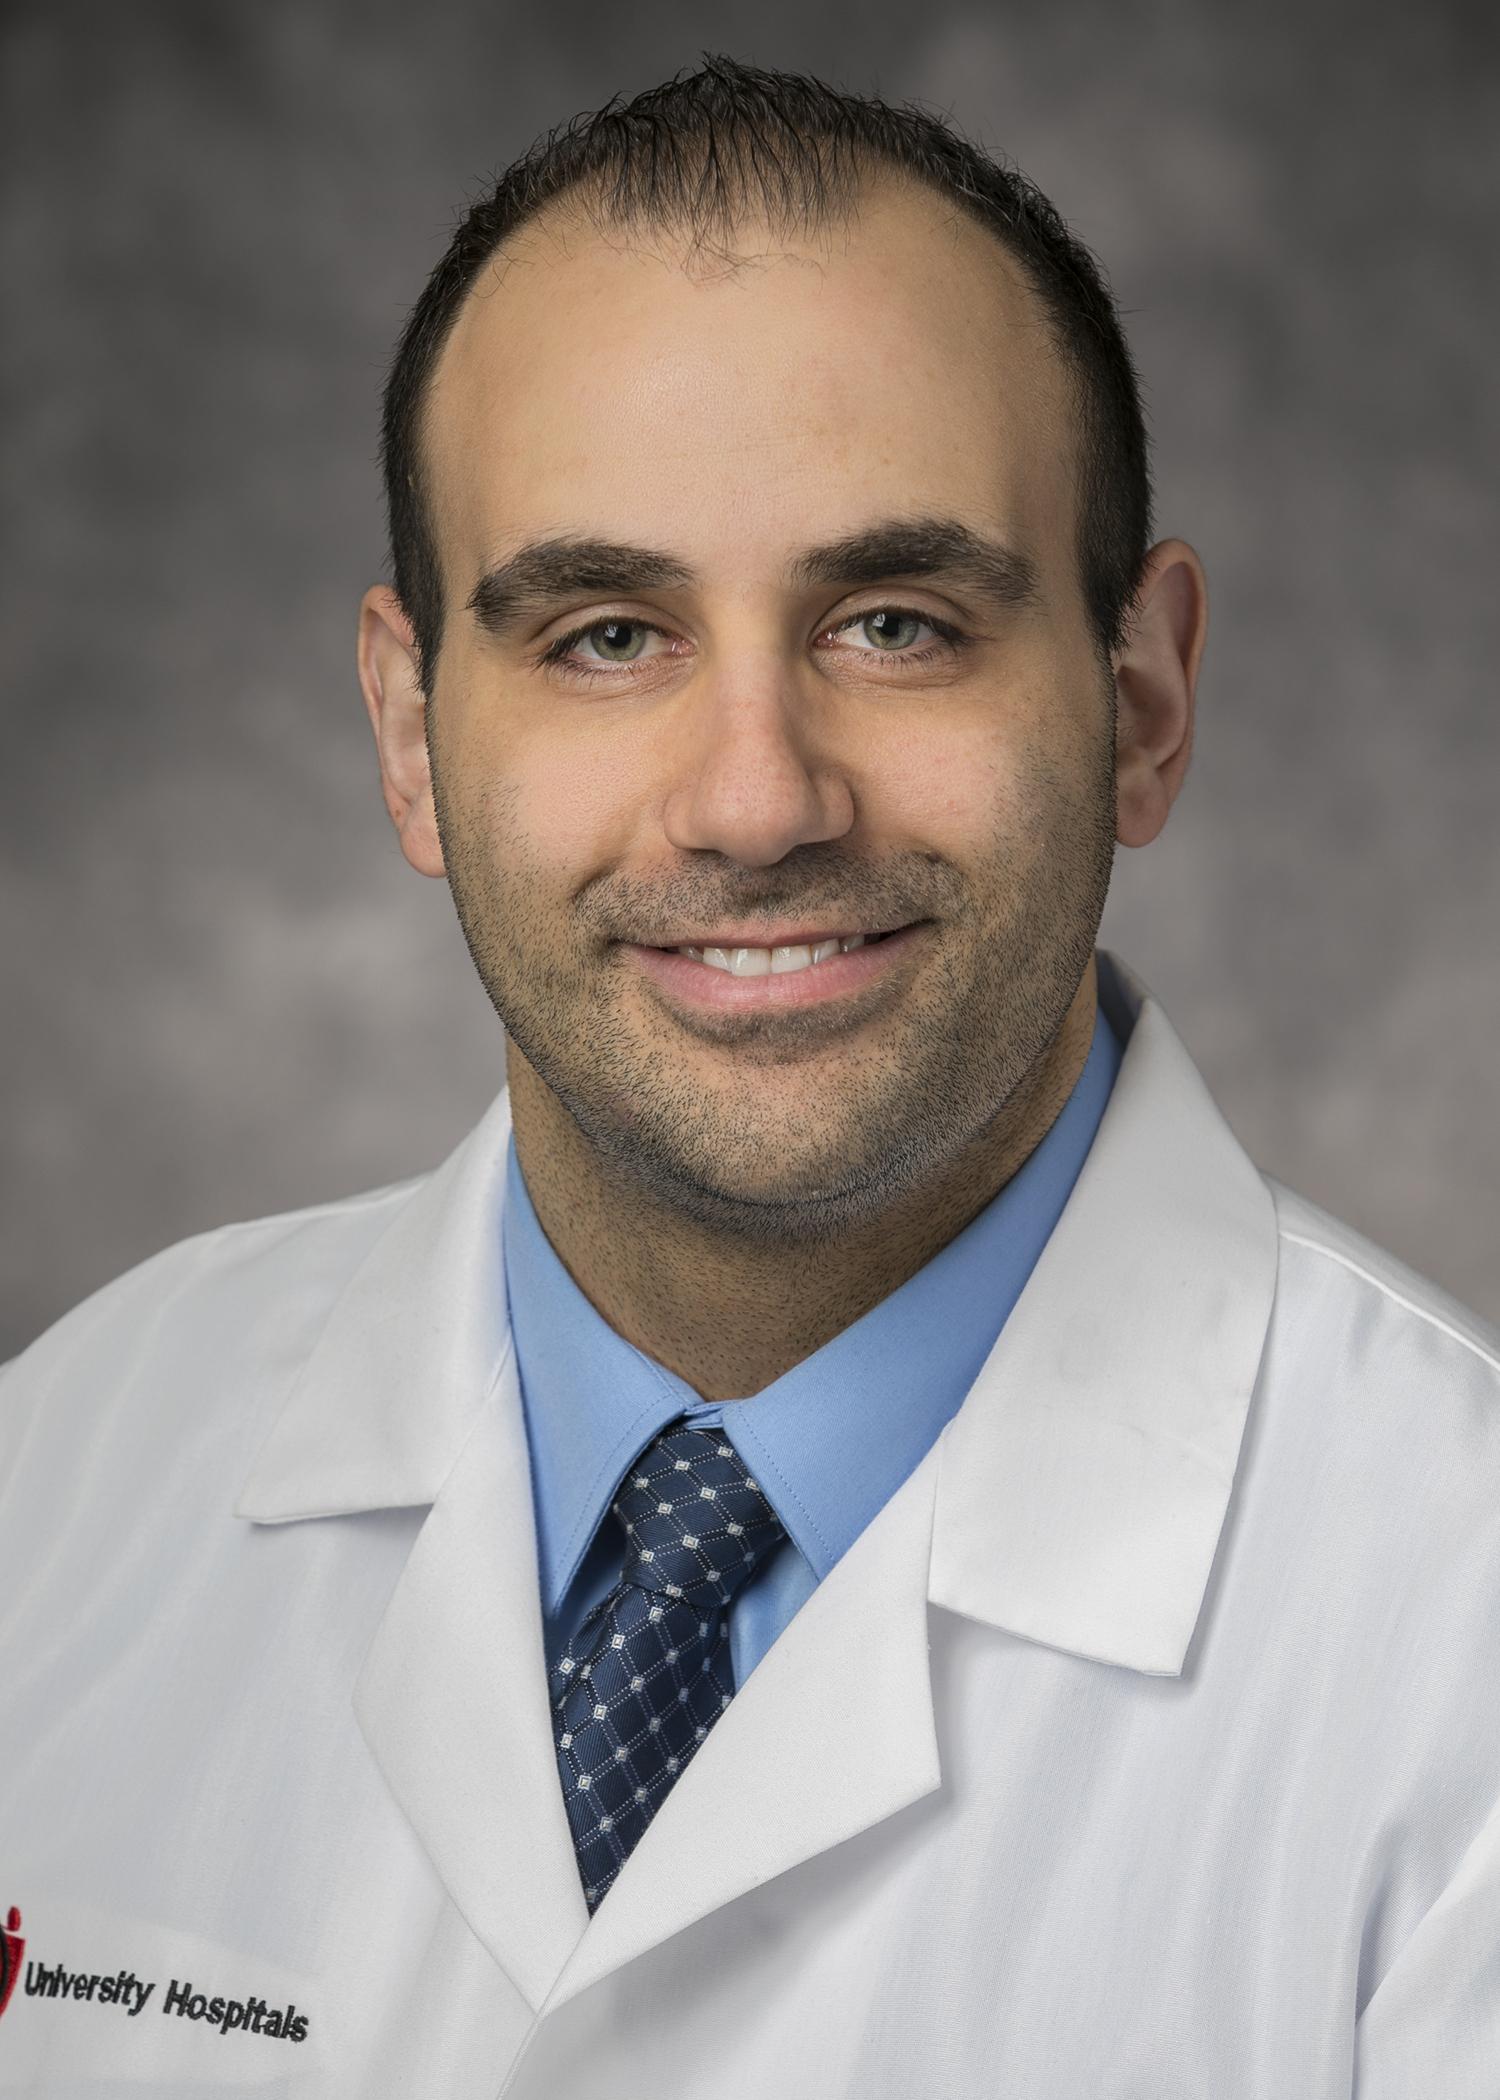 Jason Abdallah, MD